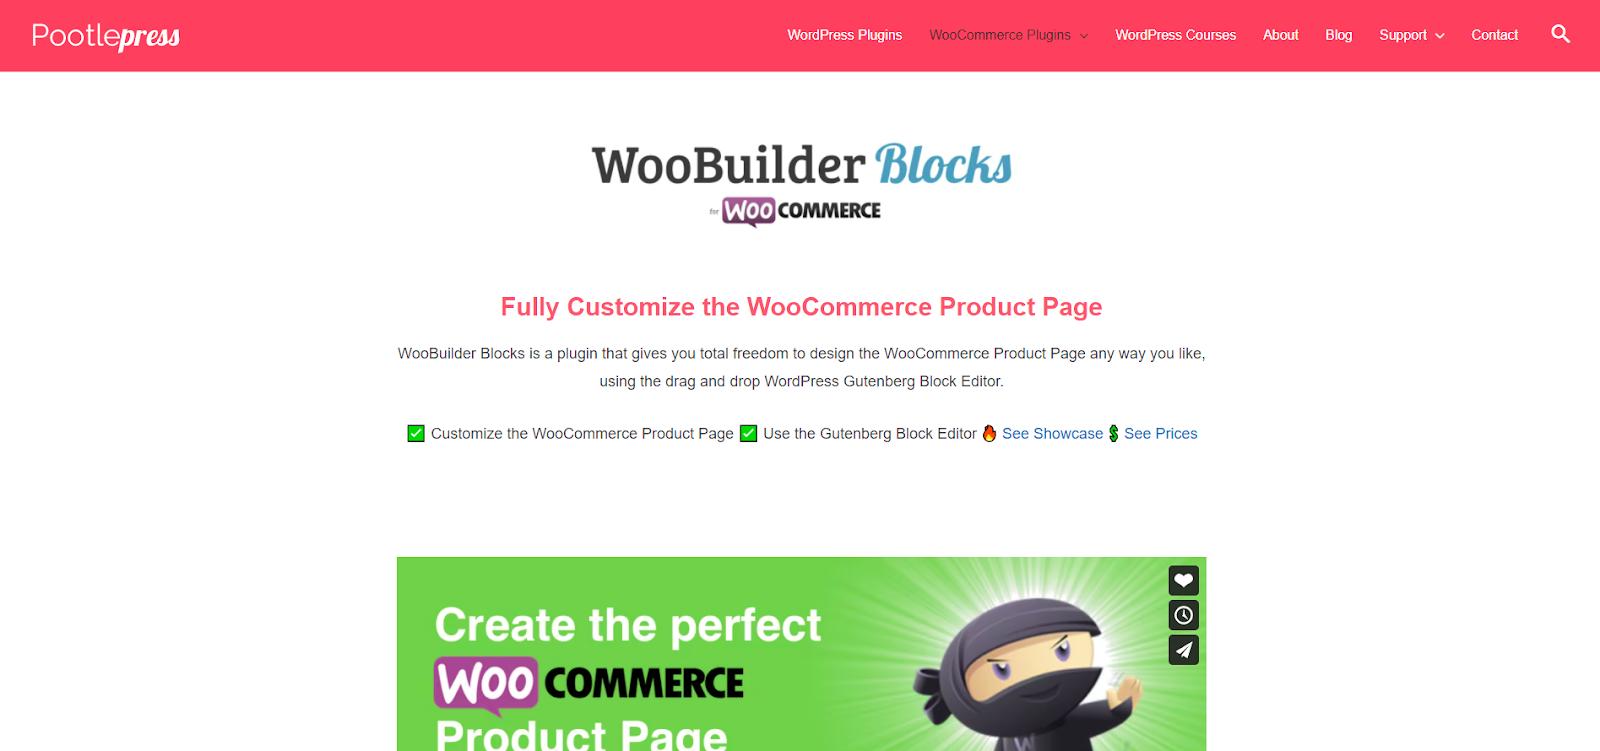 Get WooBuilder Blocks